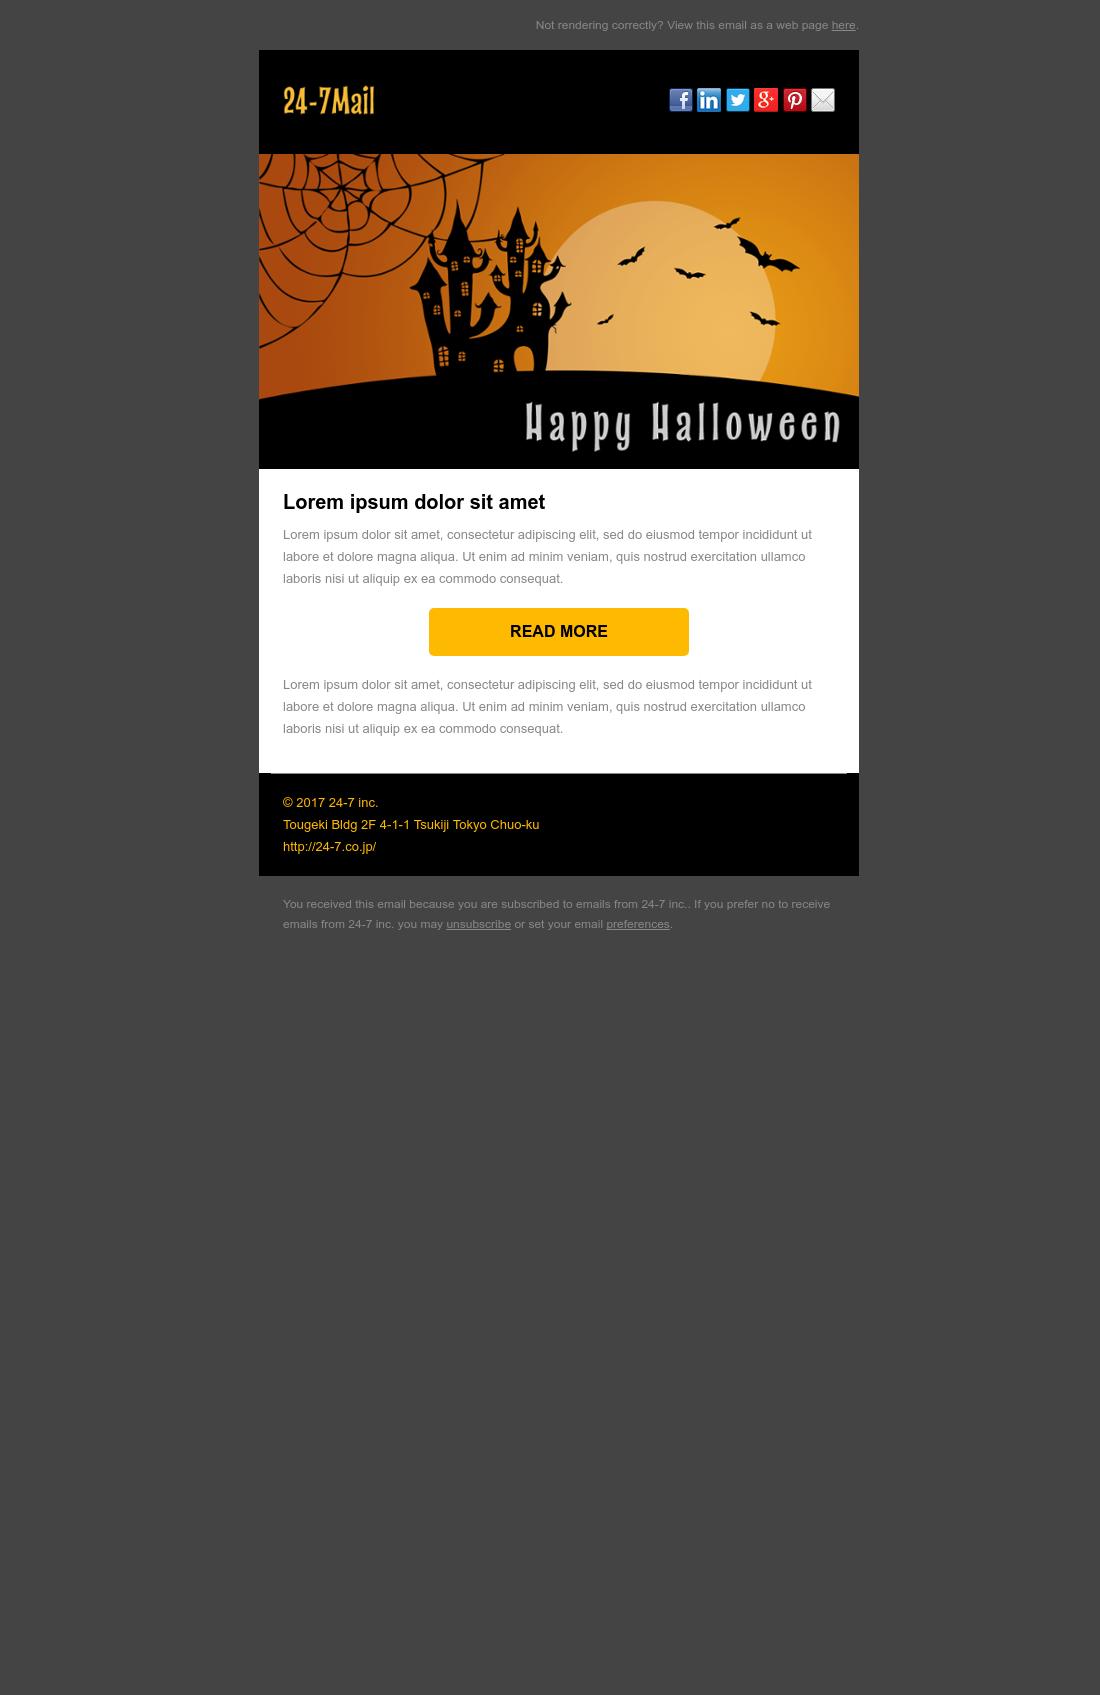 Happy halloween seasons greetings hubspot externallink maxwellsz